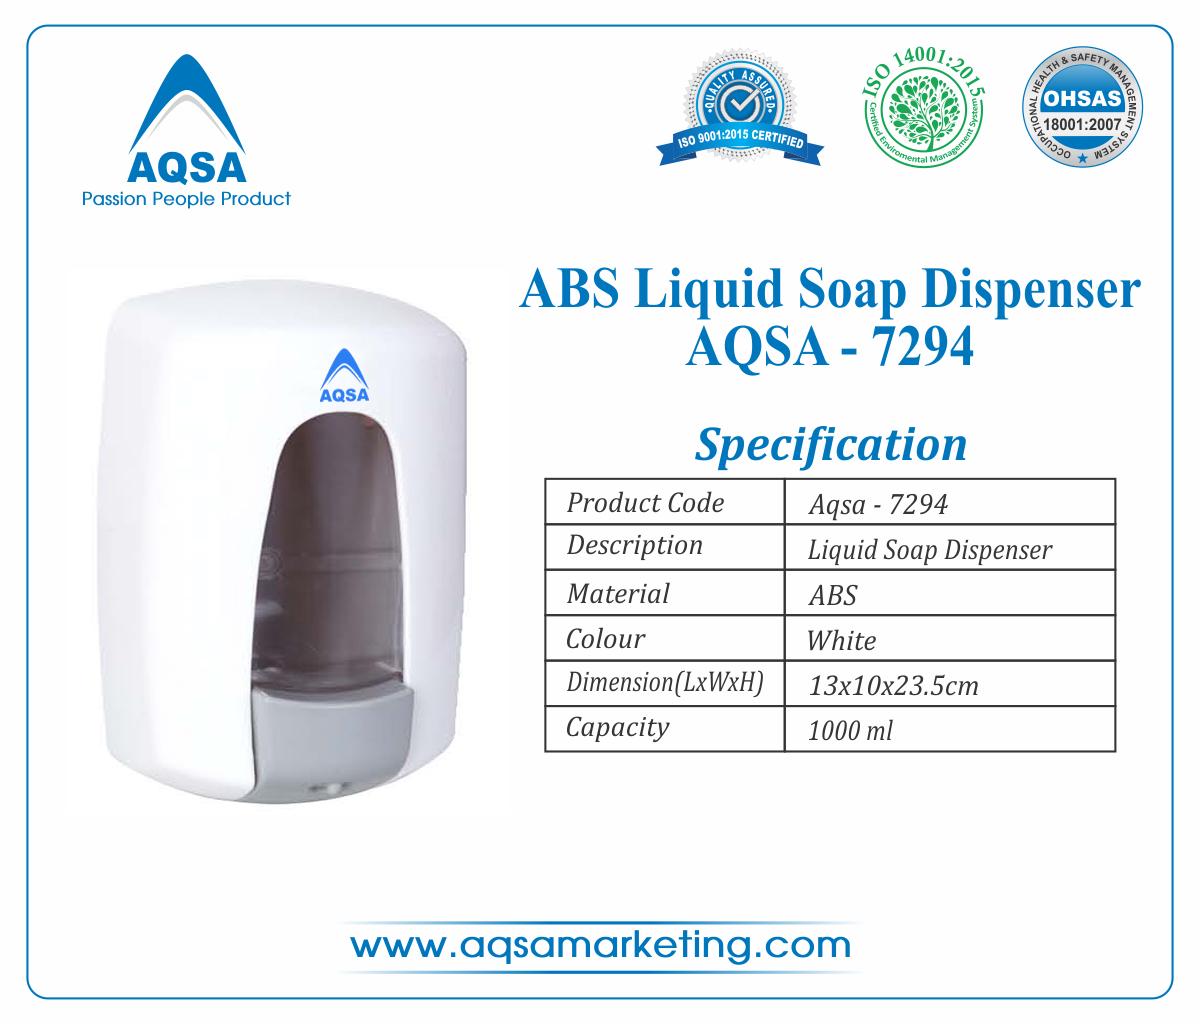 ABS Soap Dispenser  1000 ml AQSA-7294 image